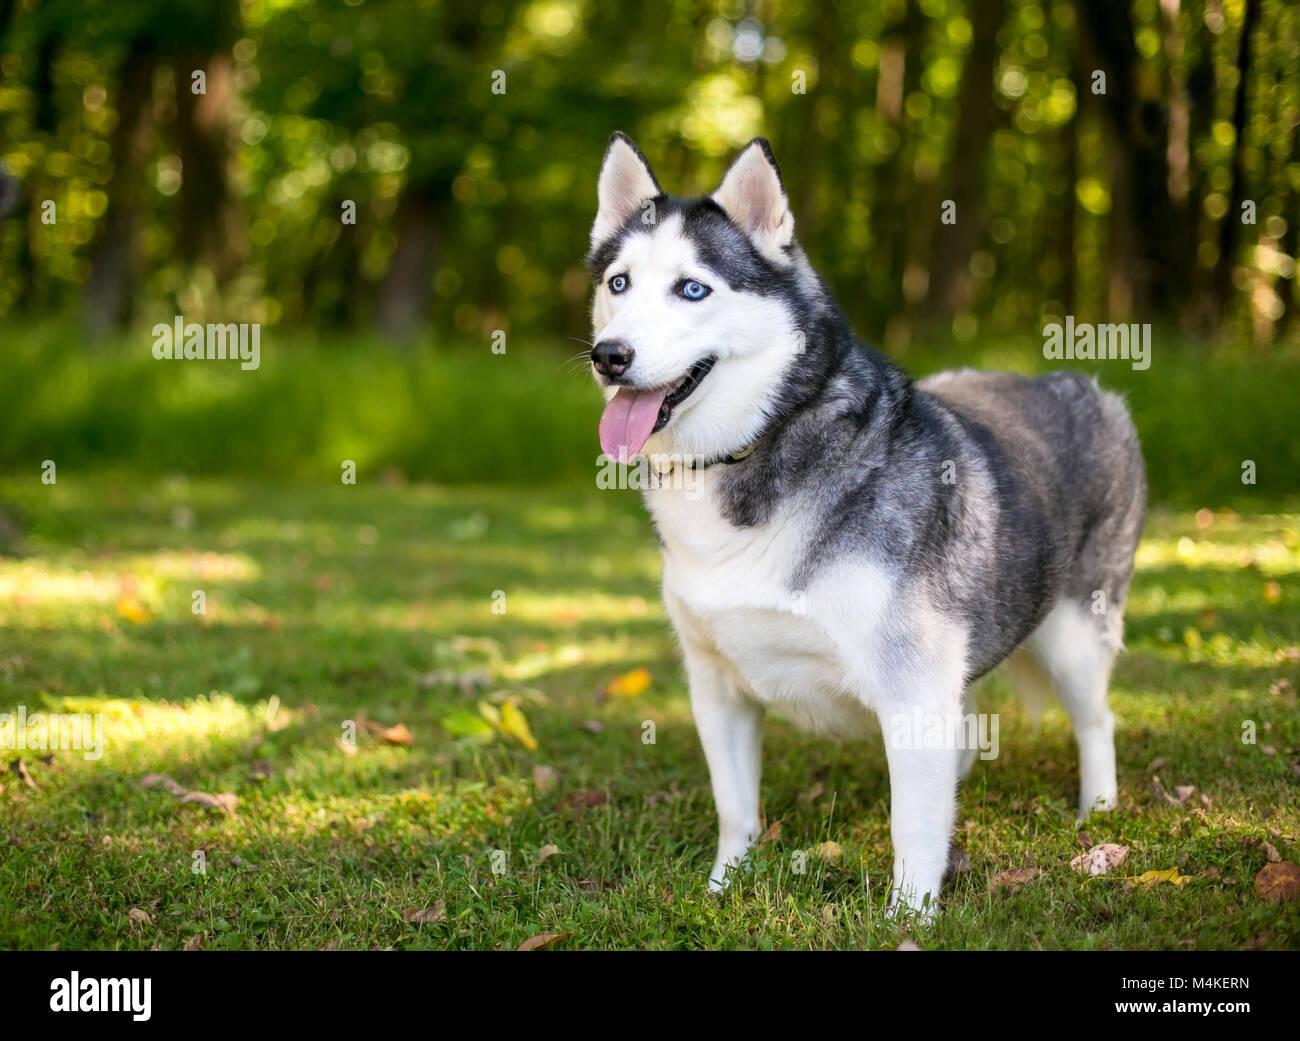 An Alaskan Husky dog outdoors - Stock Image